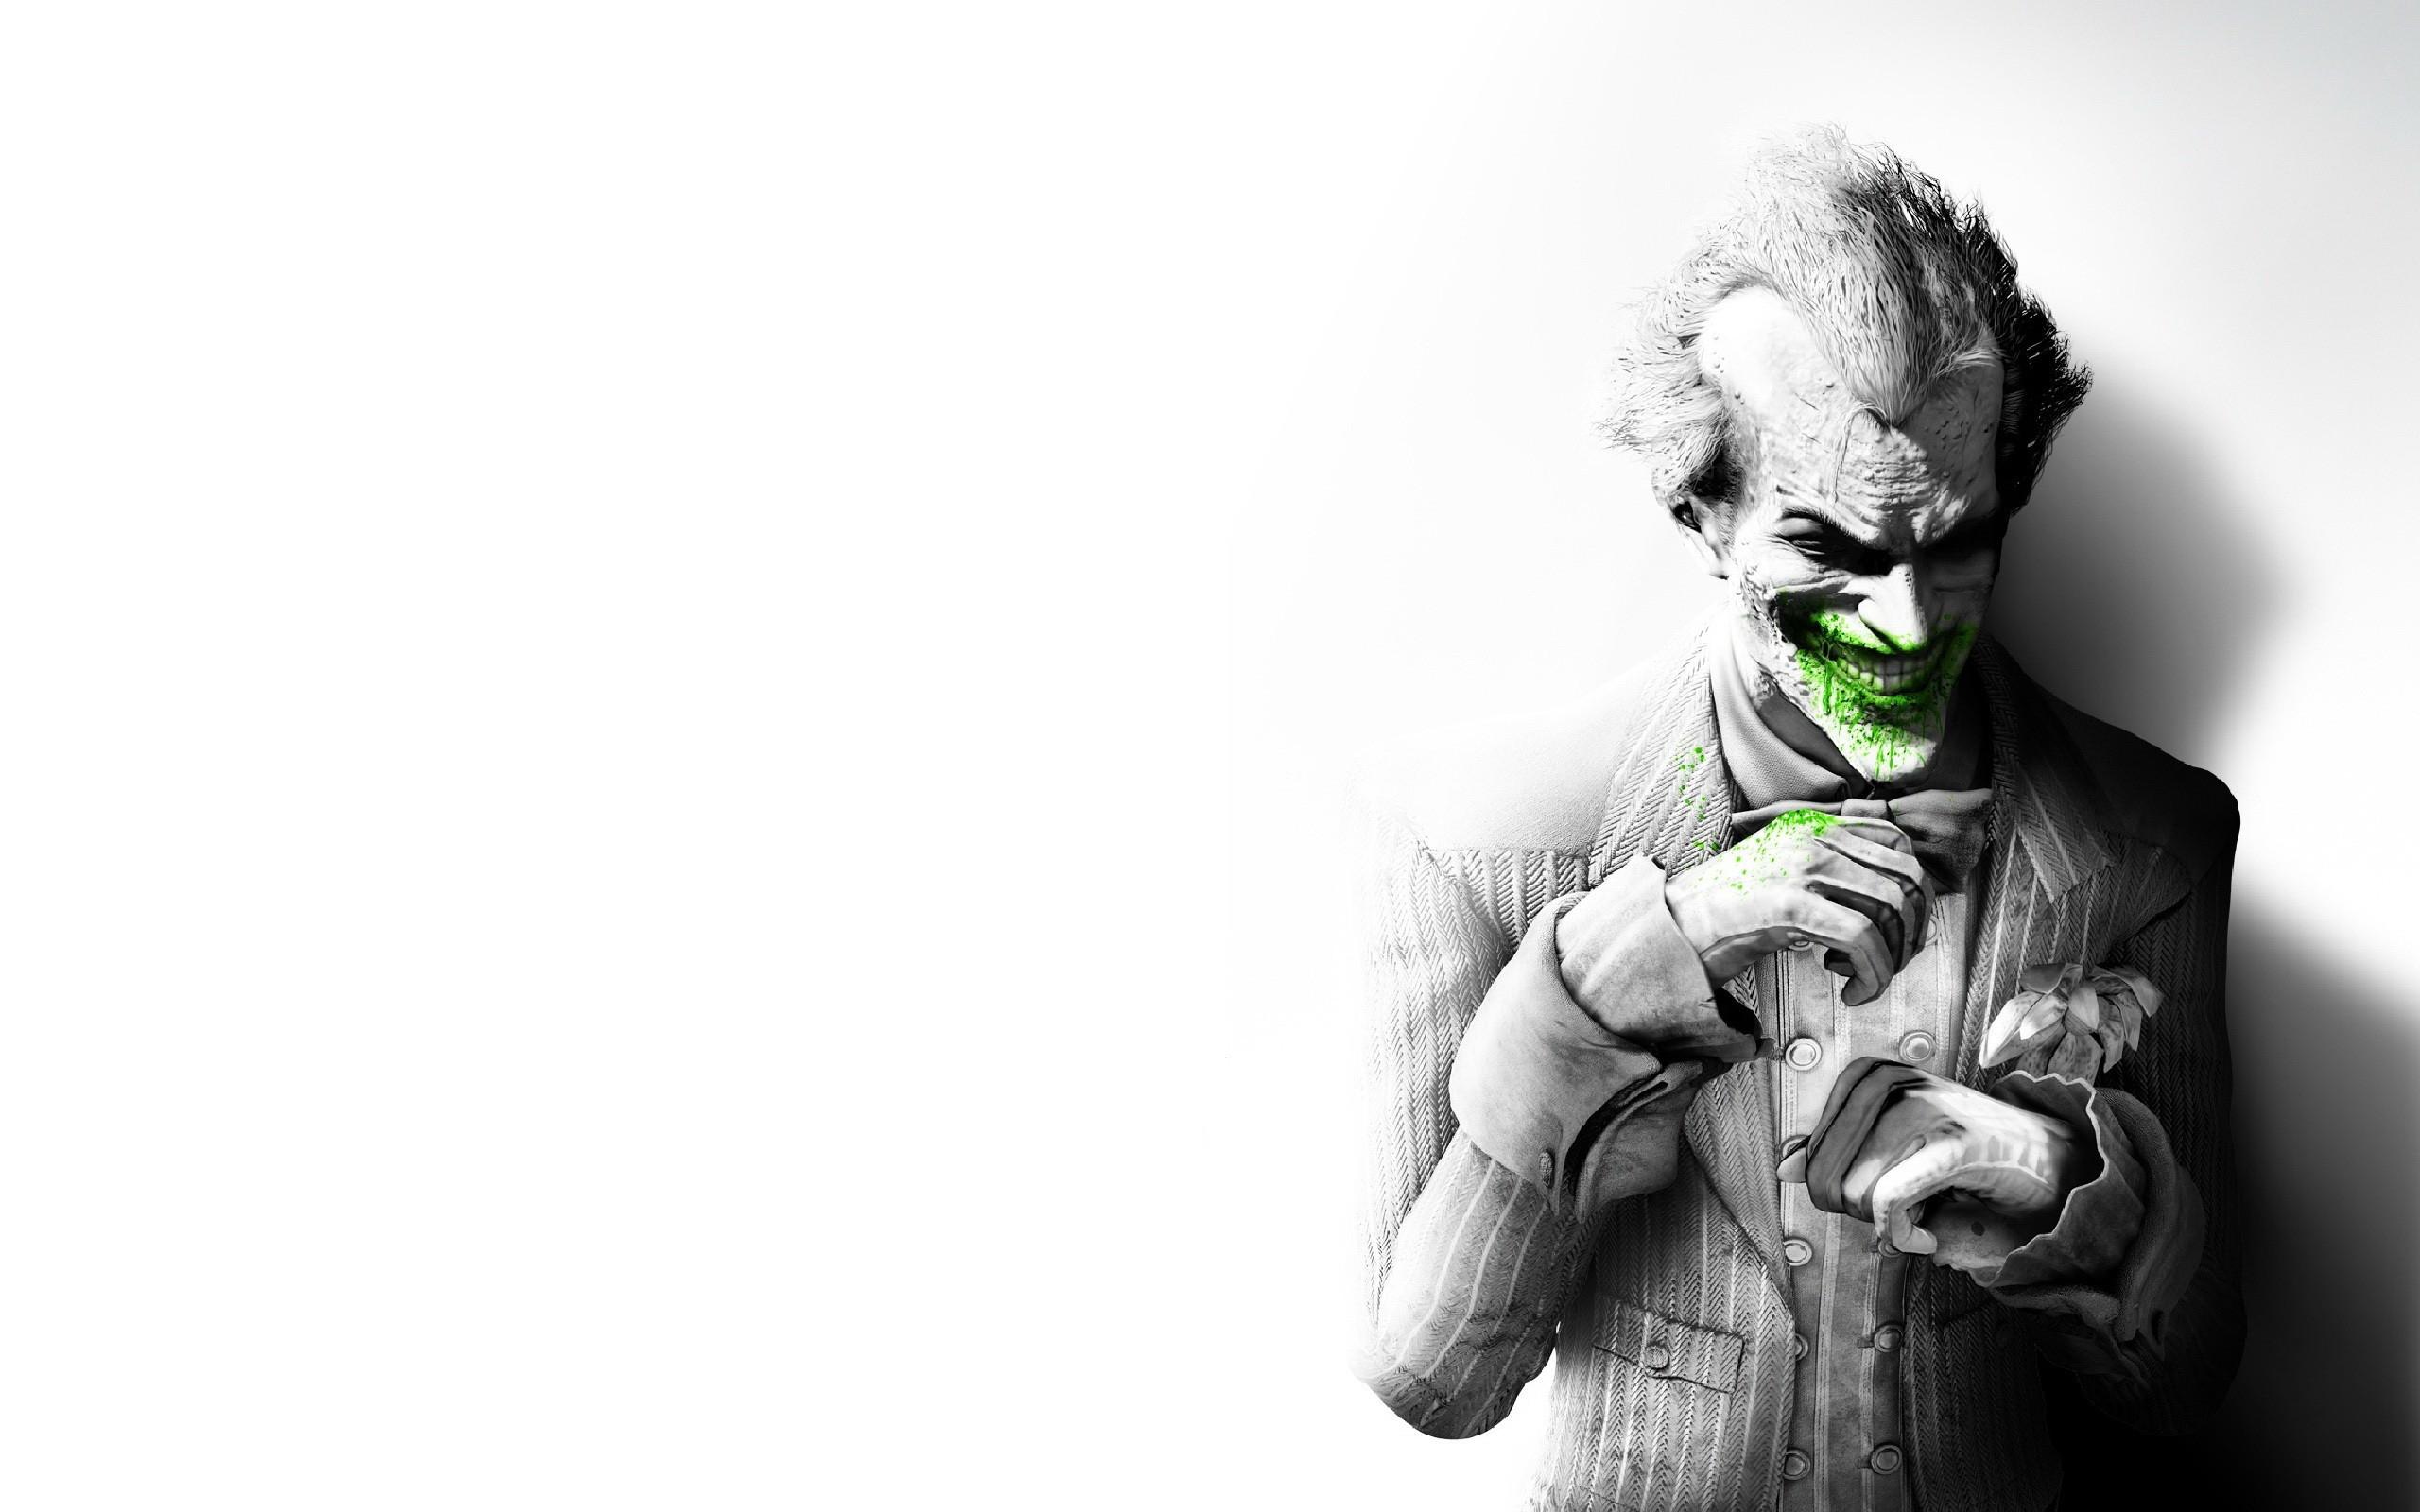 Joker HD Wallpaper Download